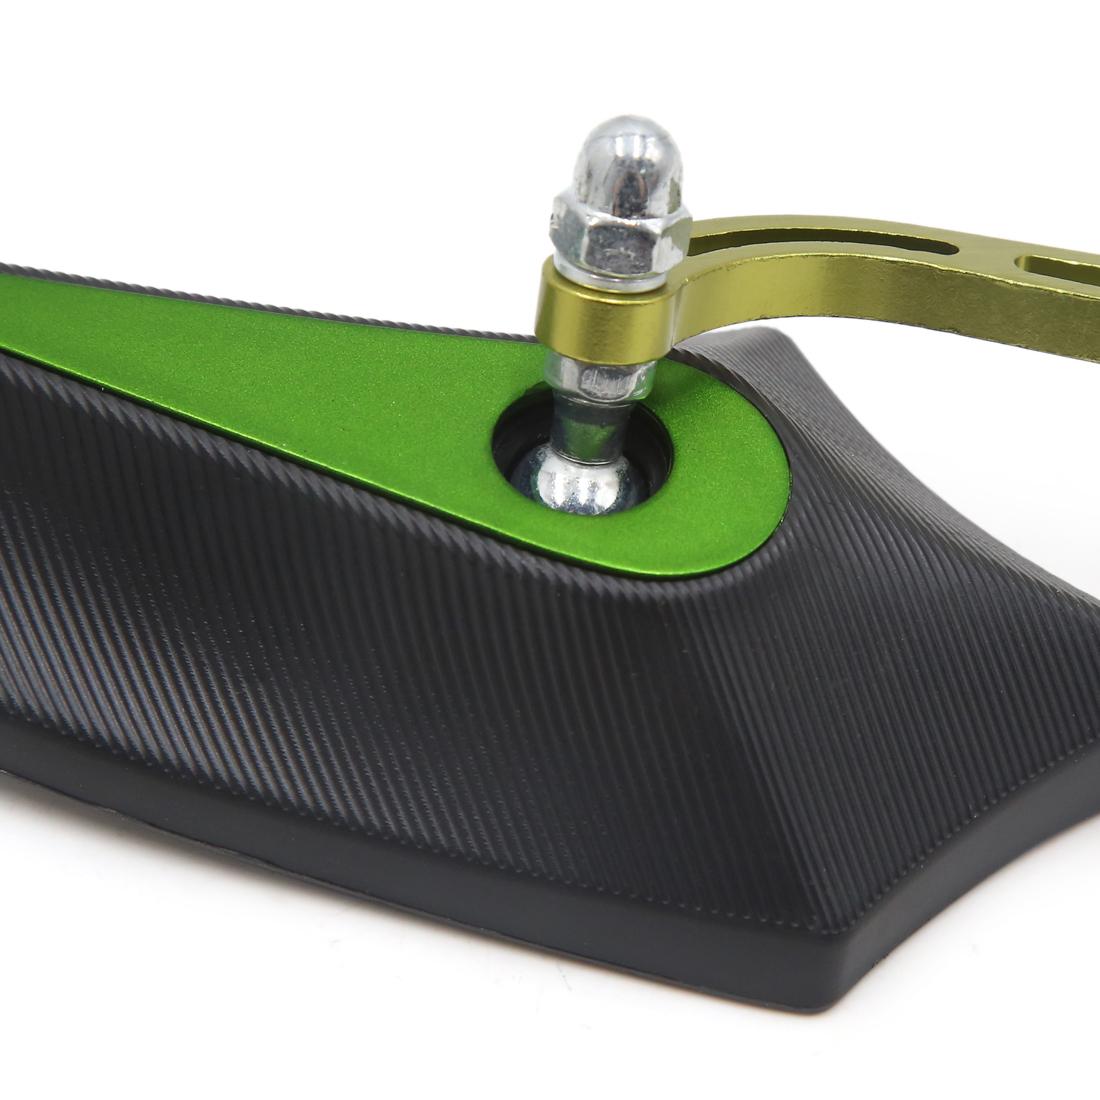 2Pcs Black Green Adjustable Pentagon Rearview Mirror for Motorcycle Motorbike - image 1 de 4